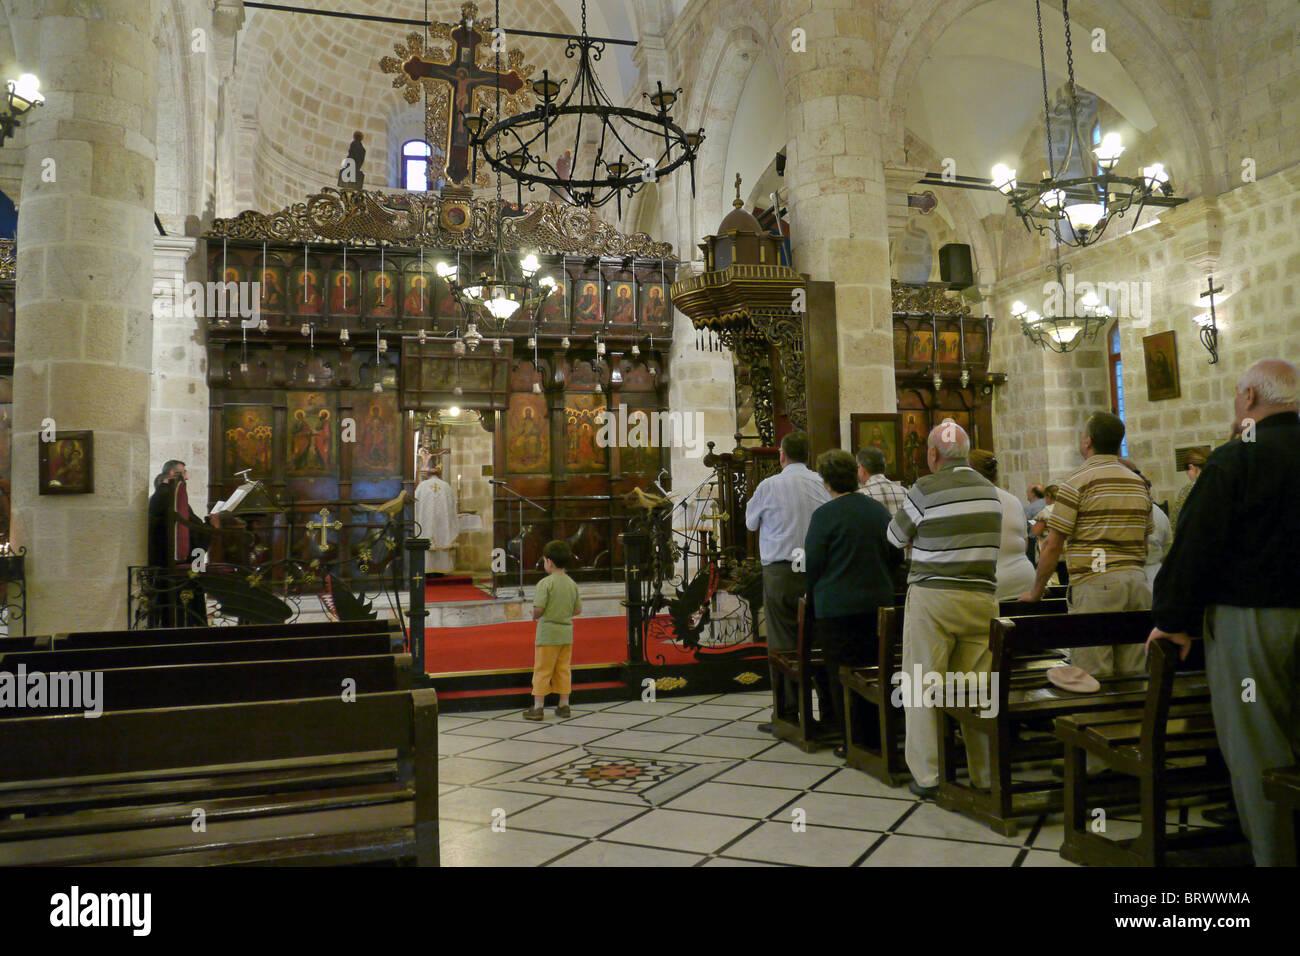 TURKEY Arabic Greek Orthodoc Cathedral, Antakya, (formerly Antioch), Hatay Province. PHOTO by SEAN SPRAGUE - Stock Image